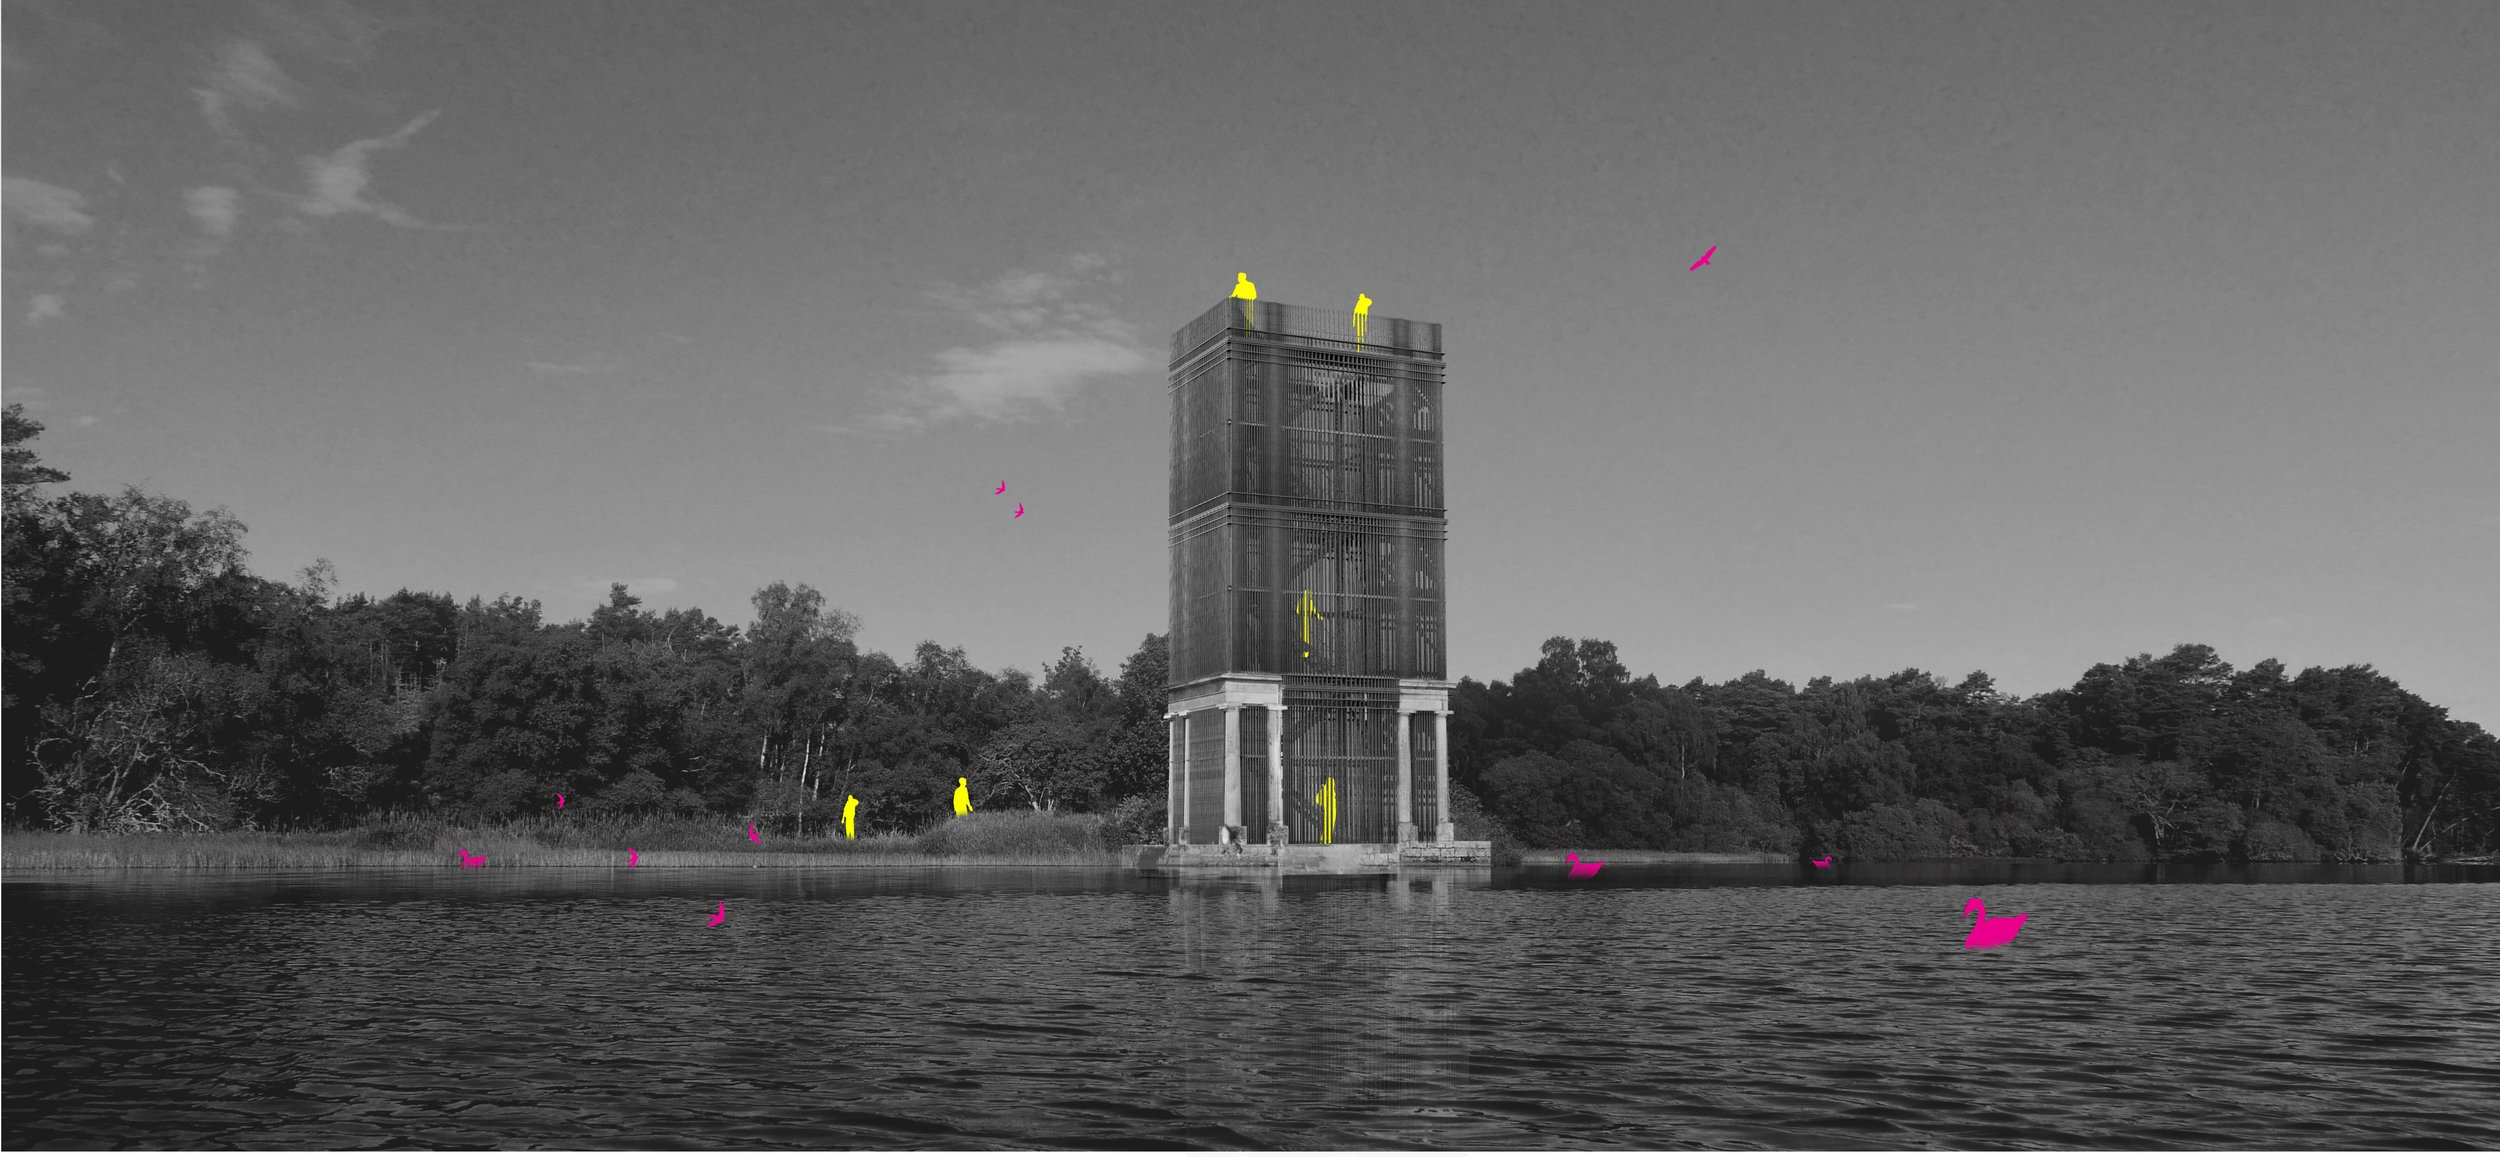 Felix Wilson - Felix-Wilson-TheArchiologist-1-Tower_III-View-From-Water.jpg